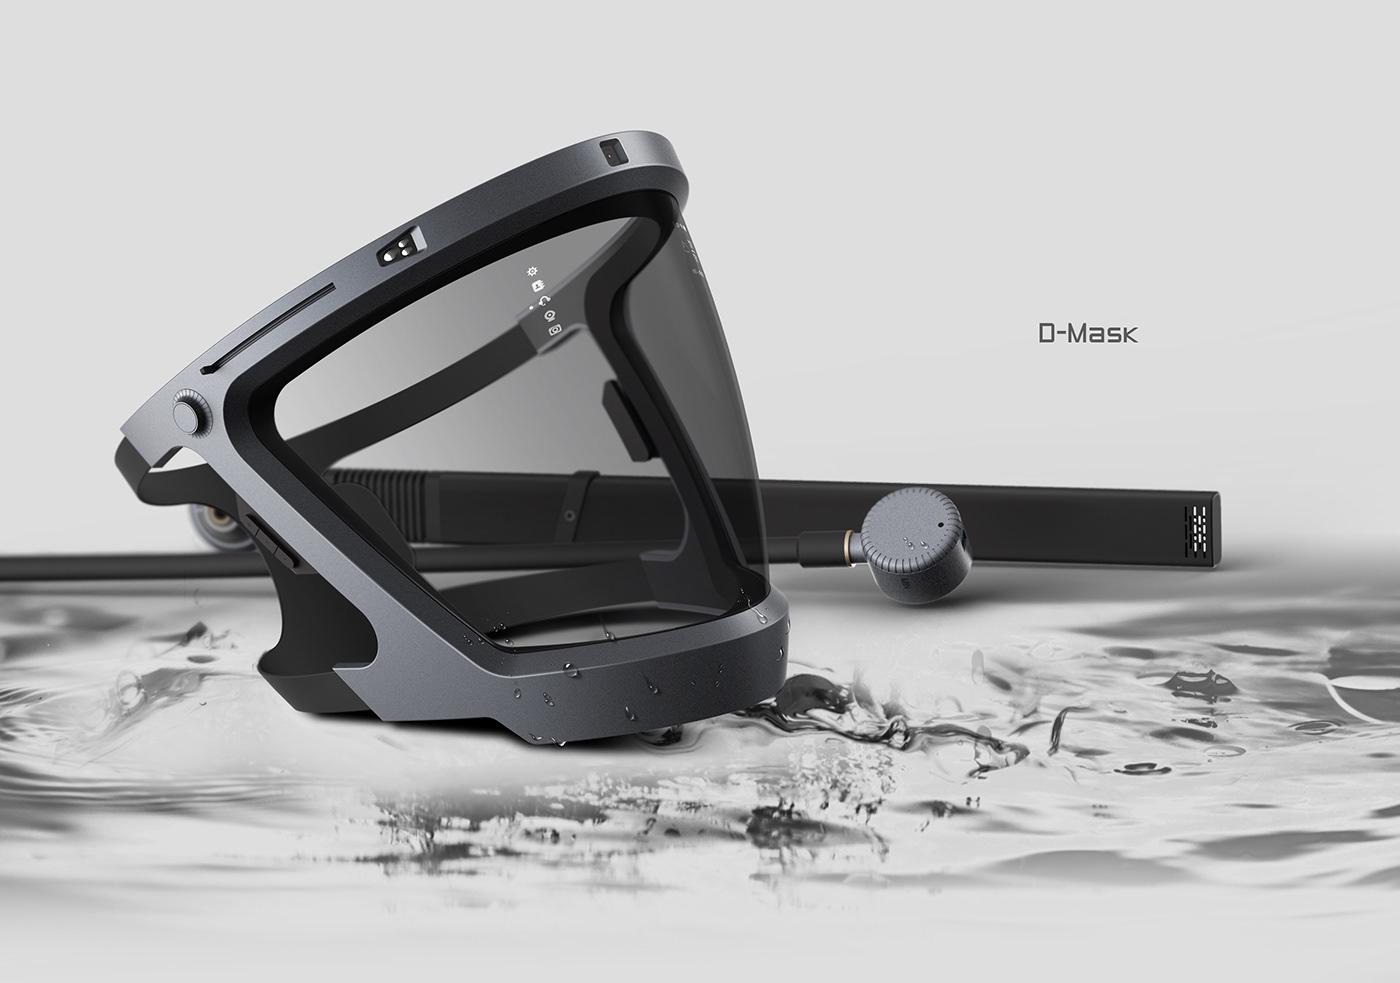 smart-diving-d-mask-concept-noko-03.jpg